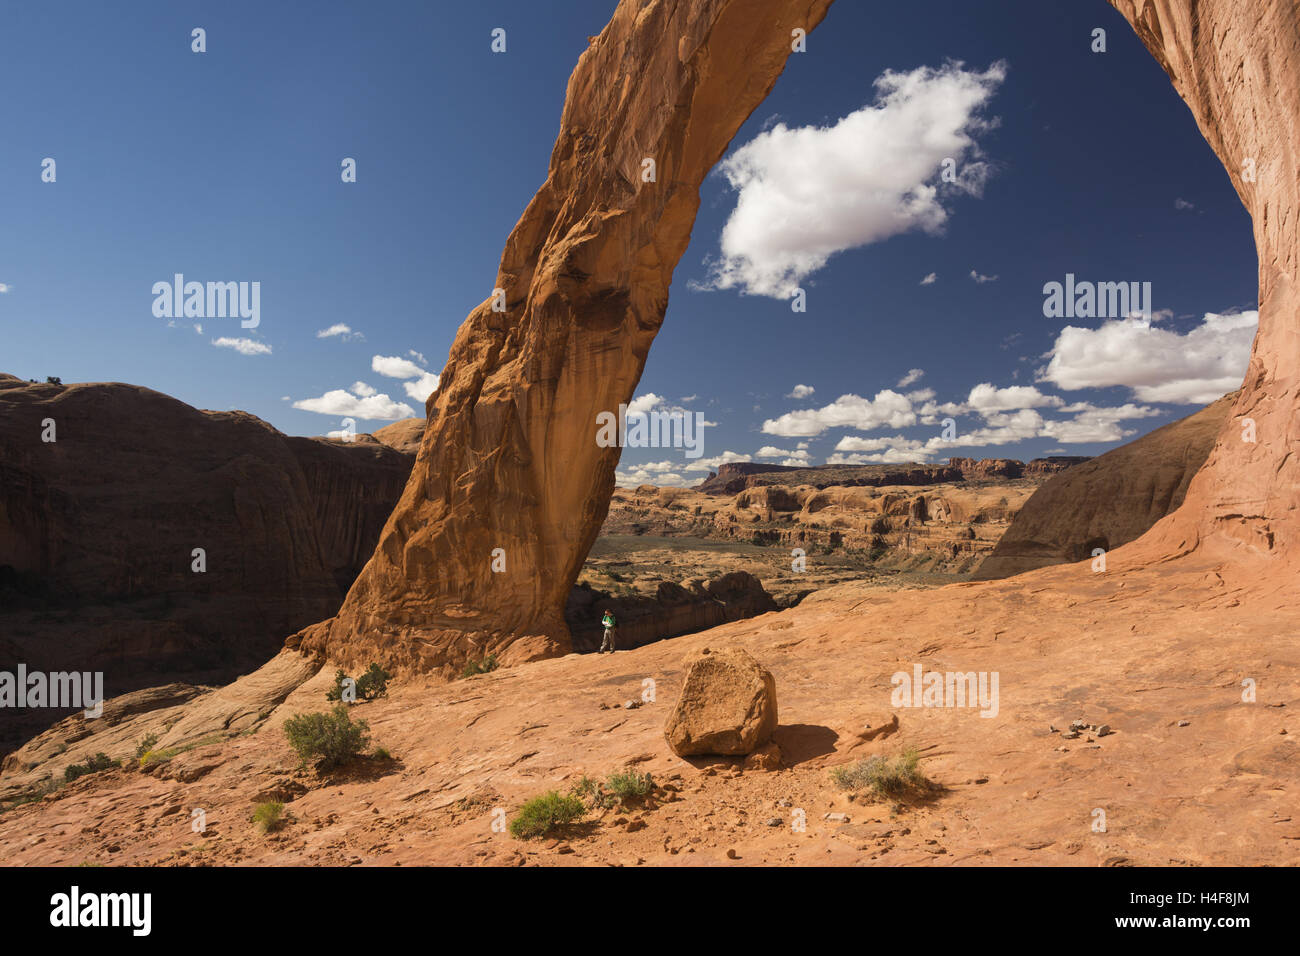 Utah, Potash-Lower Colorado River Scenic Byway, Corona Arch - Stock Image